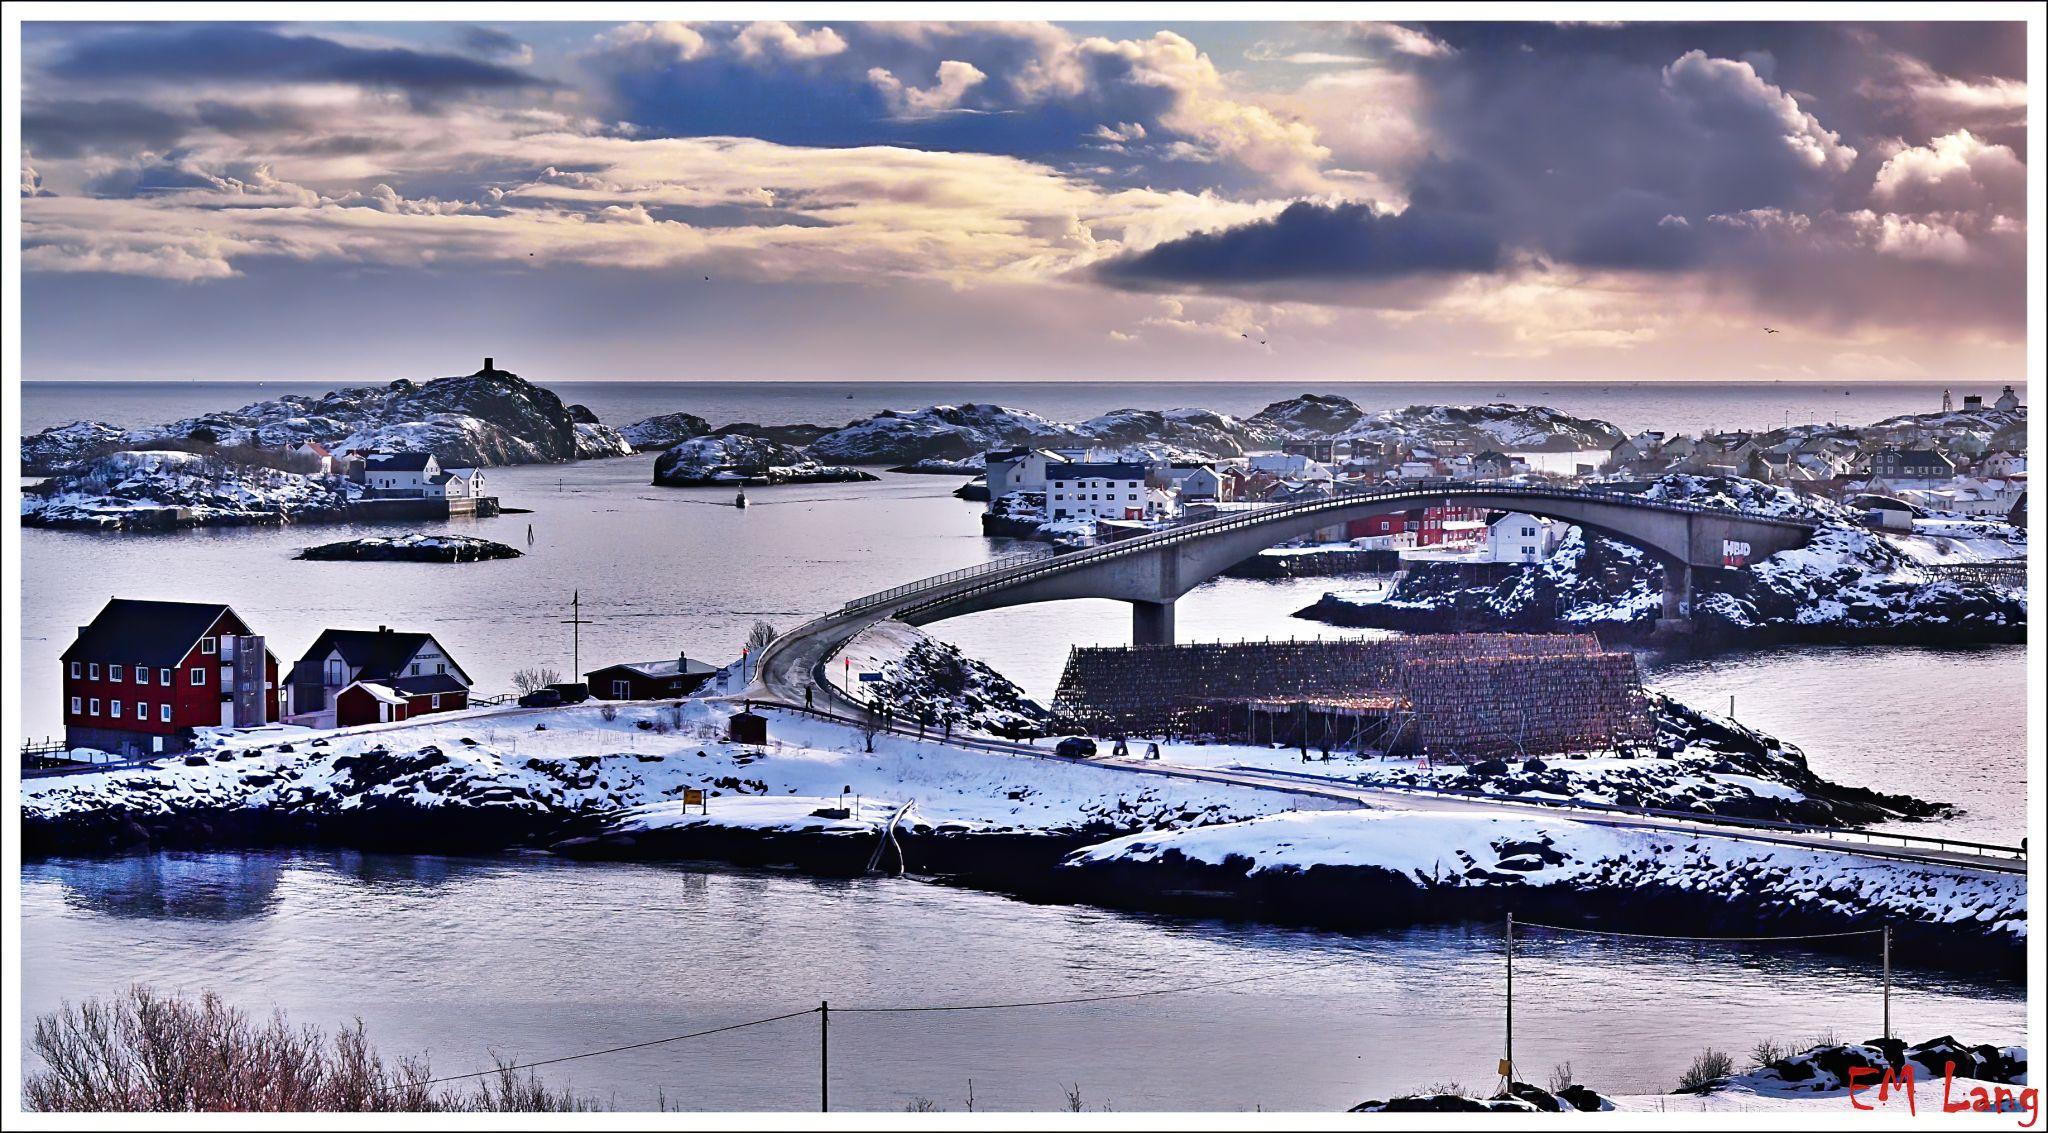 Bridge to Henningsvaer, Norway